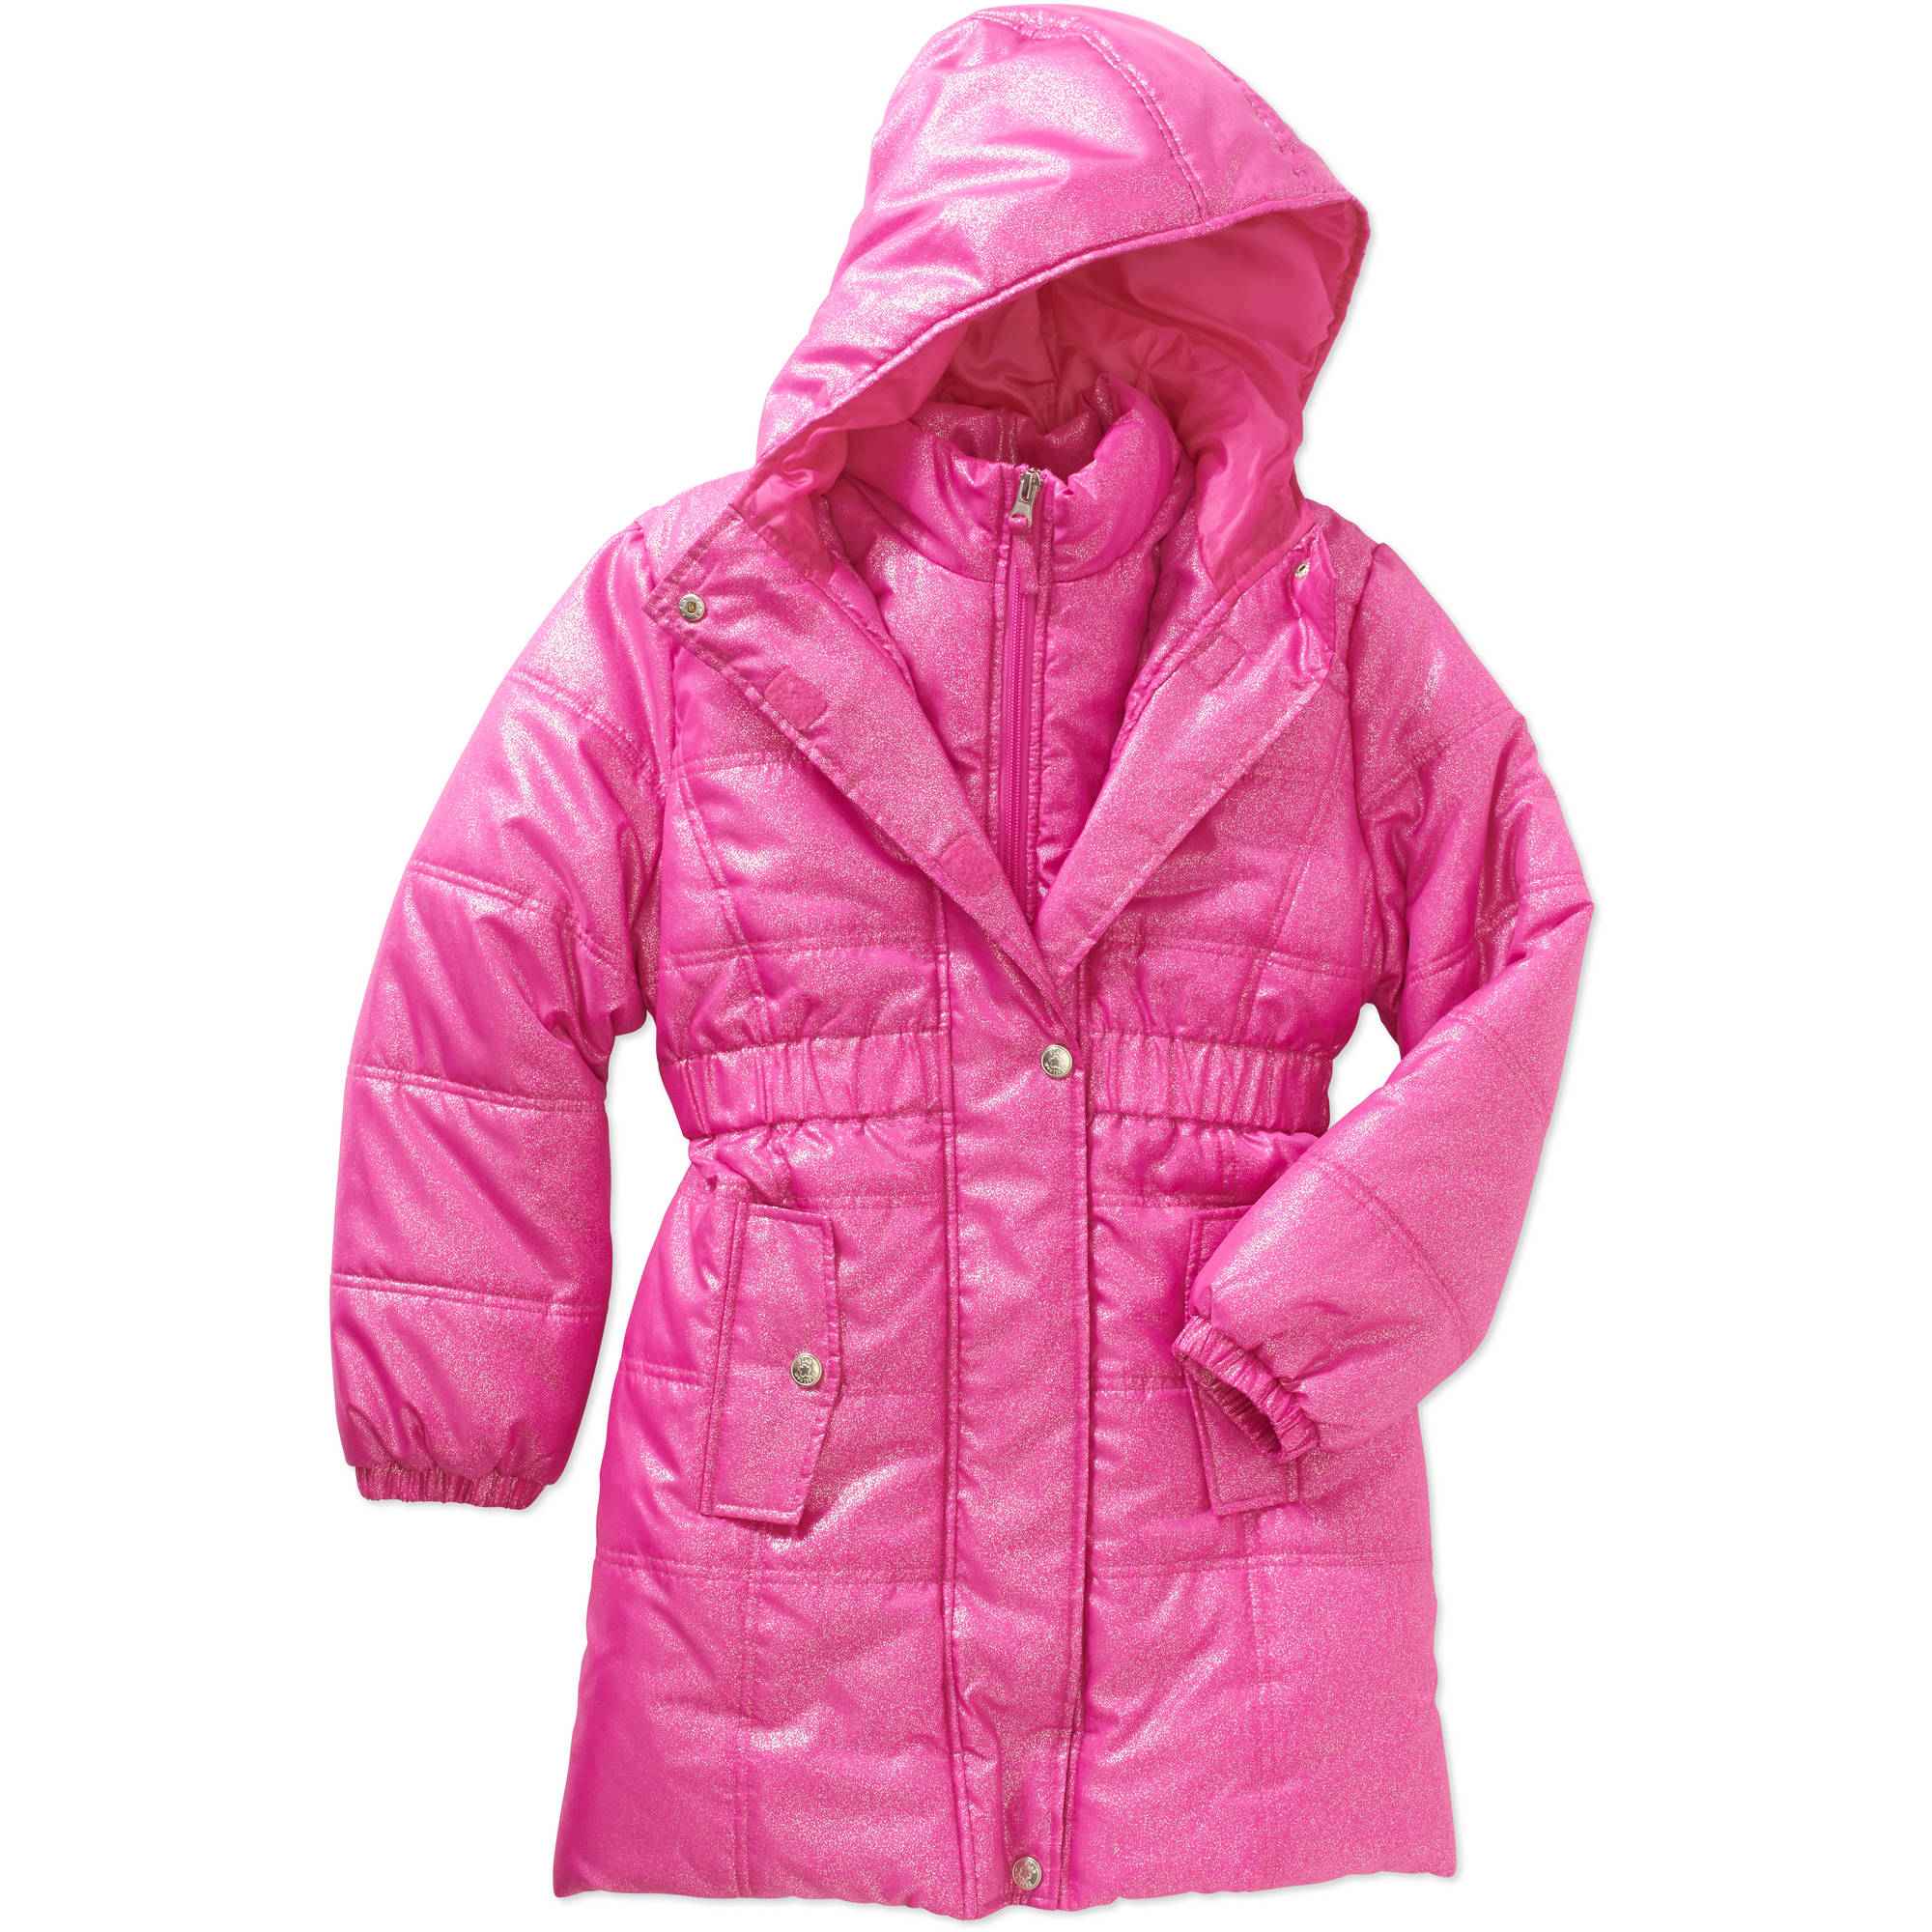 Pink Platinum Girls' Spray Foil Puffer Jacket with Pockets